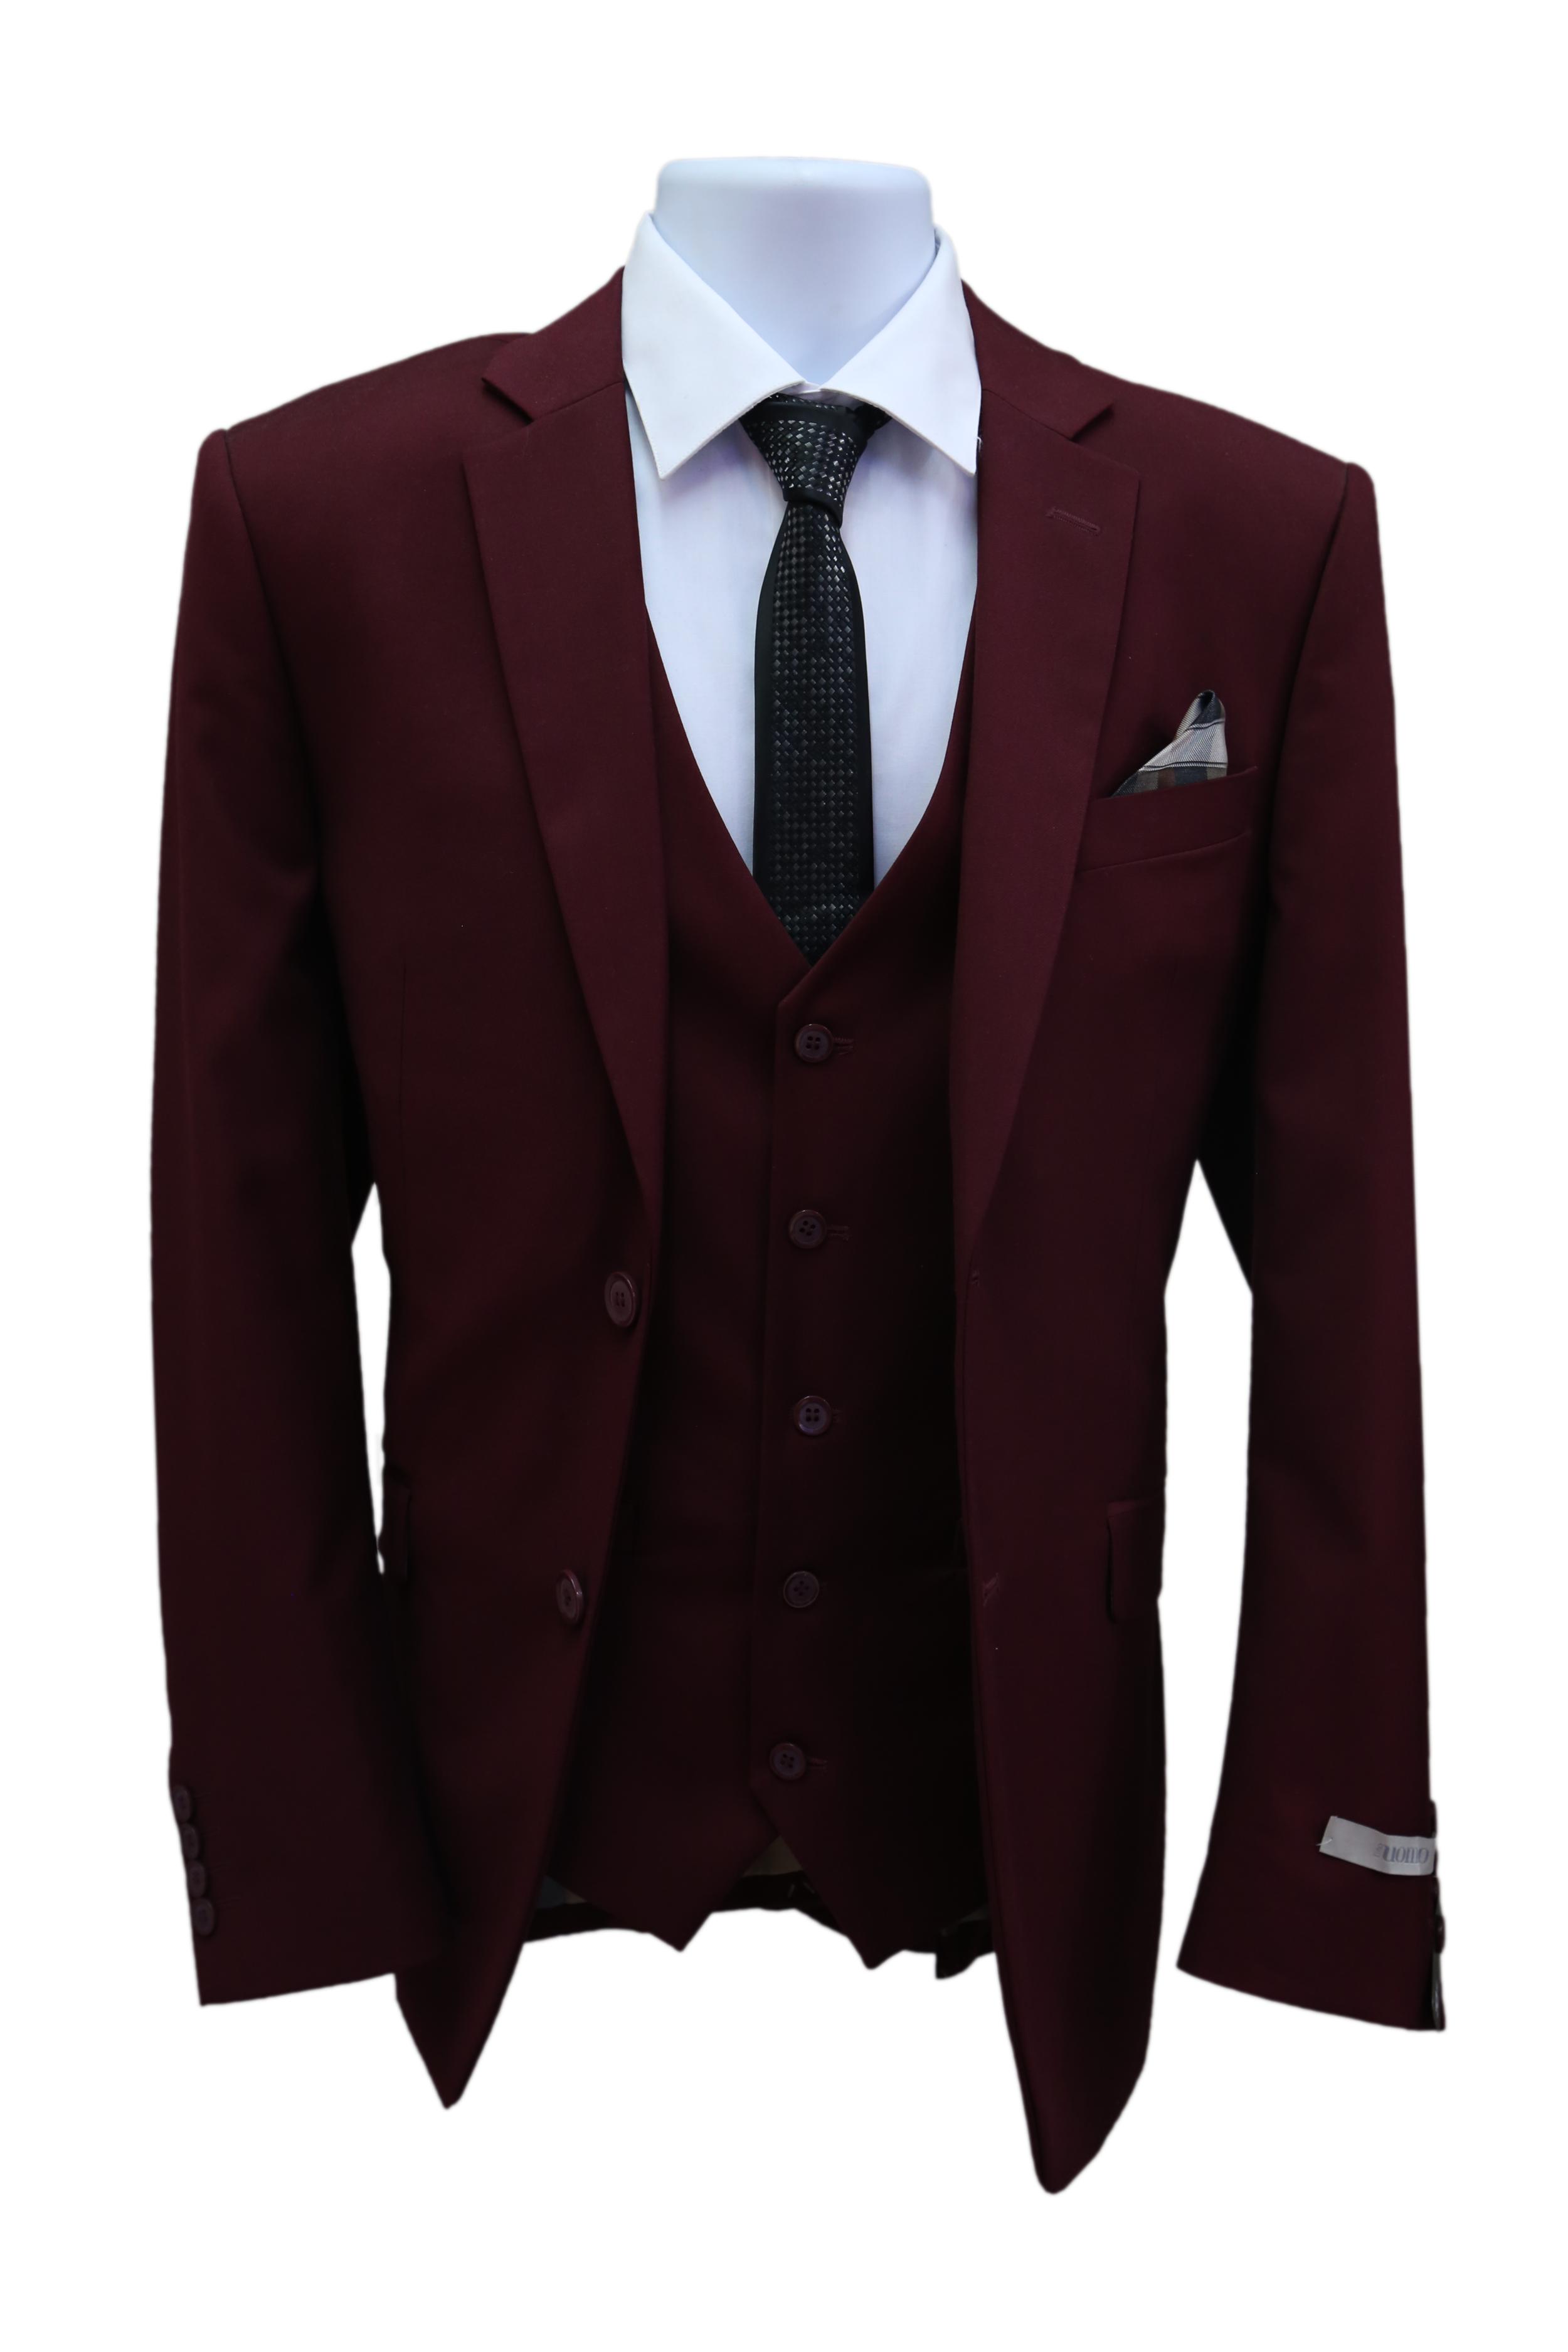 03  Dark Red Suit.png